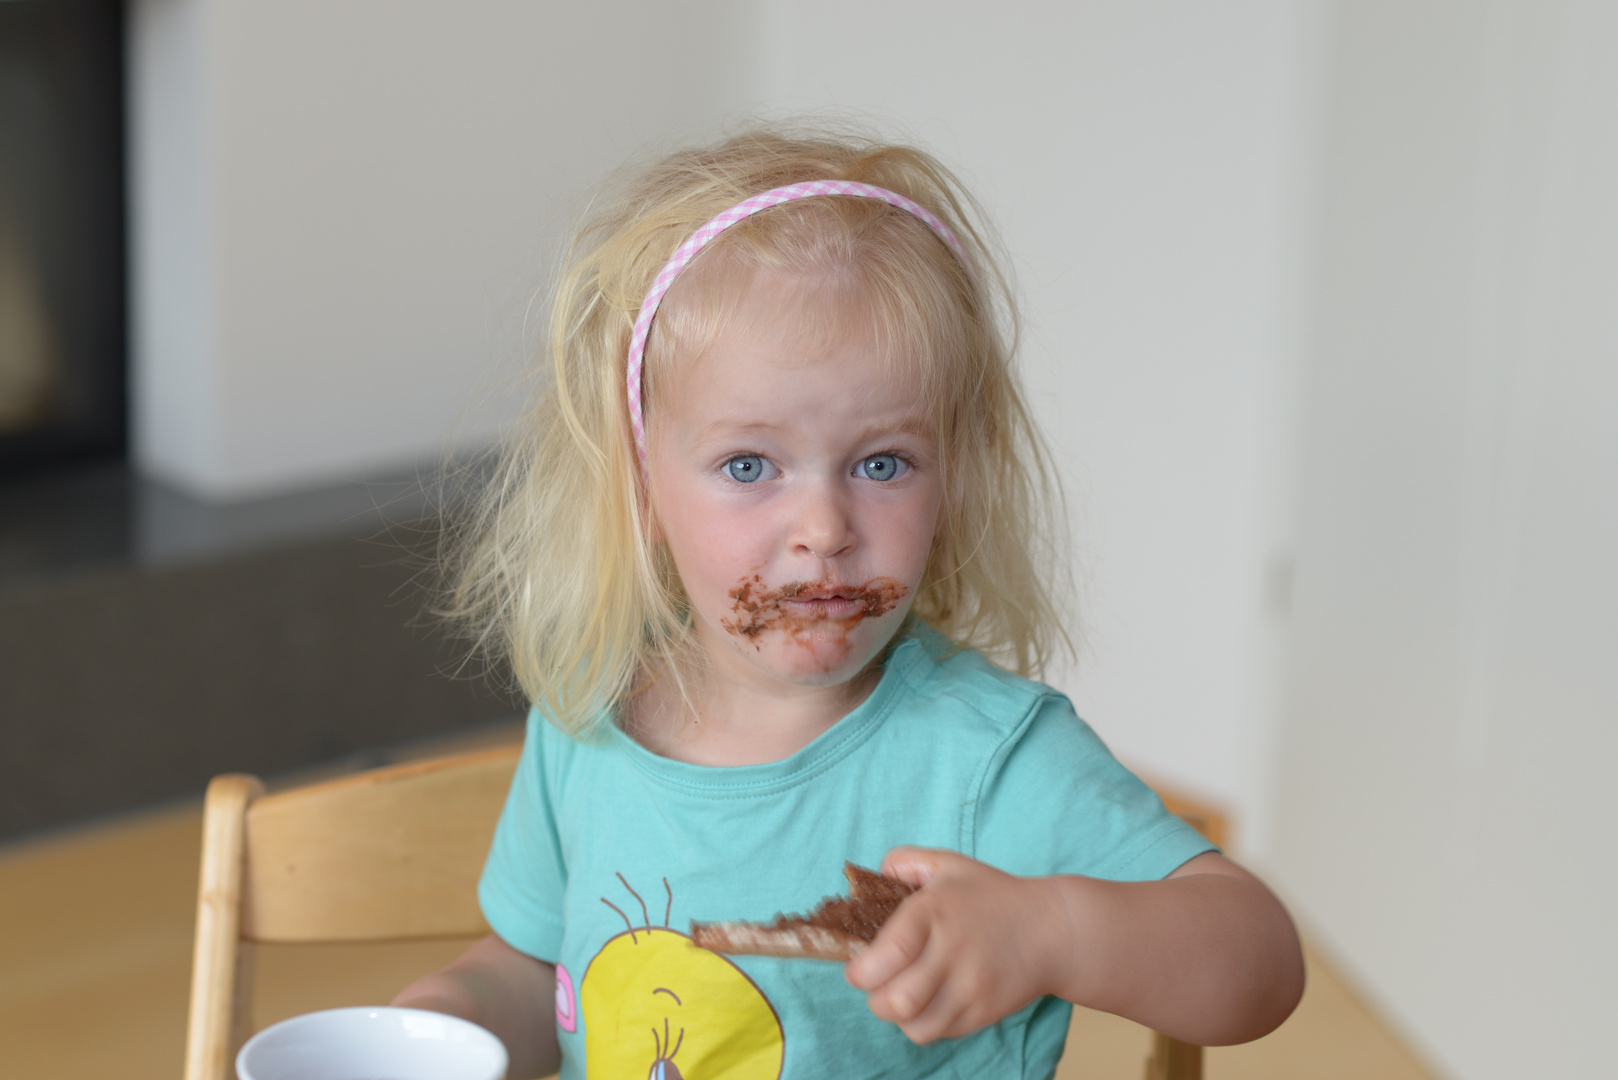 Schokolade Zum Frühstück Foto Bild Kinder Kinder Ab 2